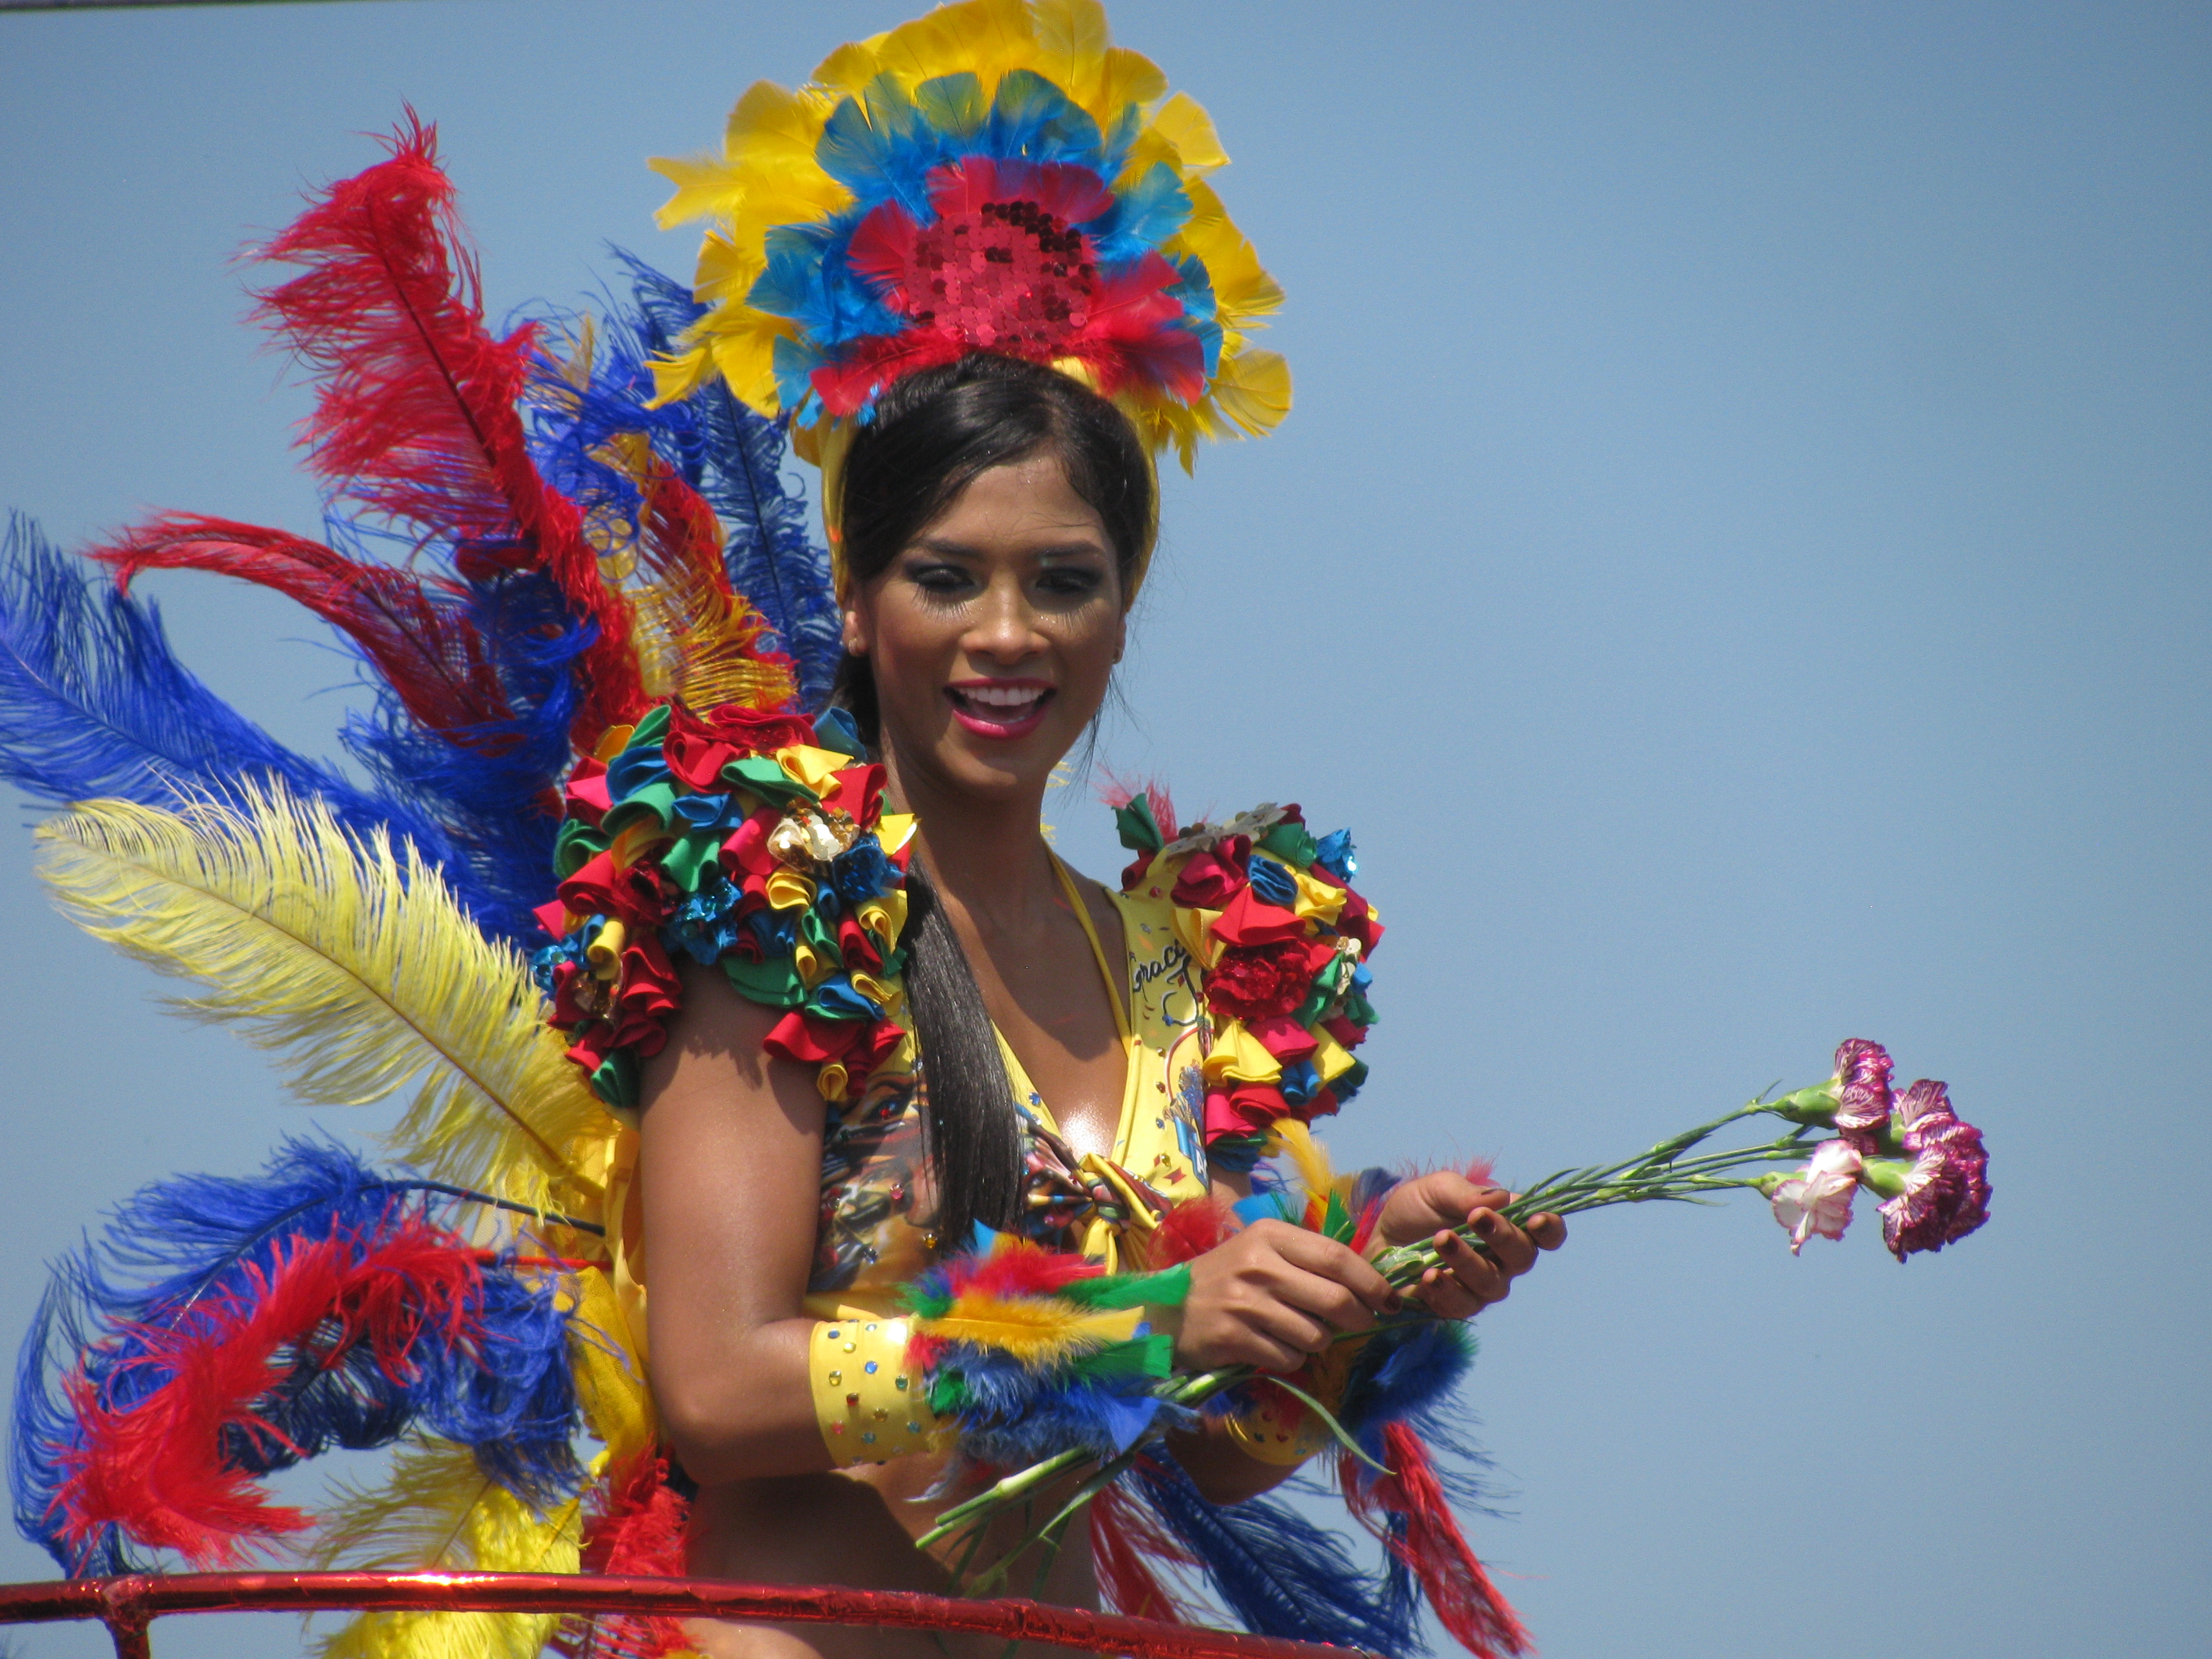 Carnaval em Barranquilha, Colômbia